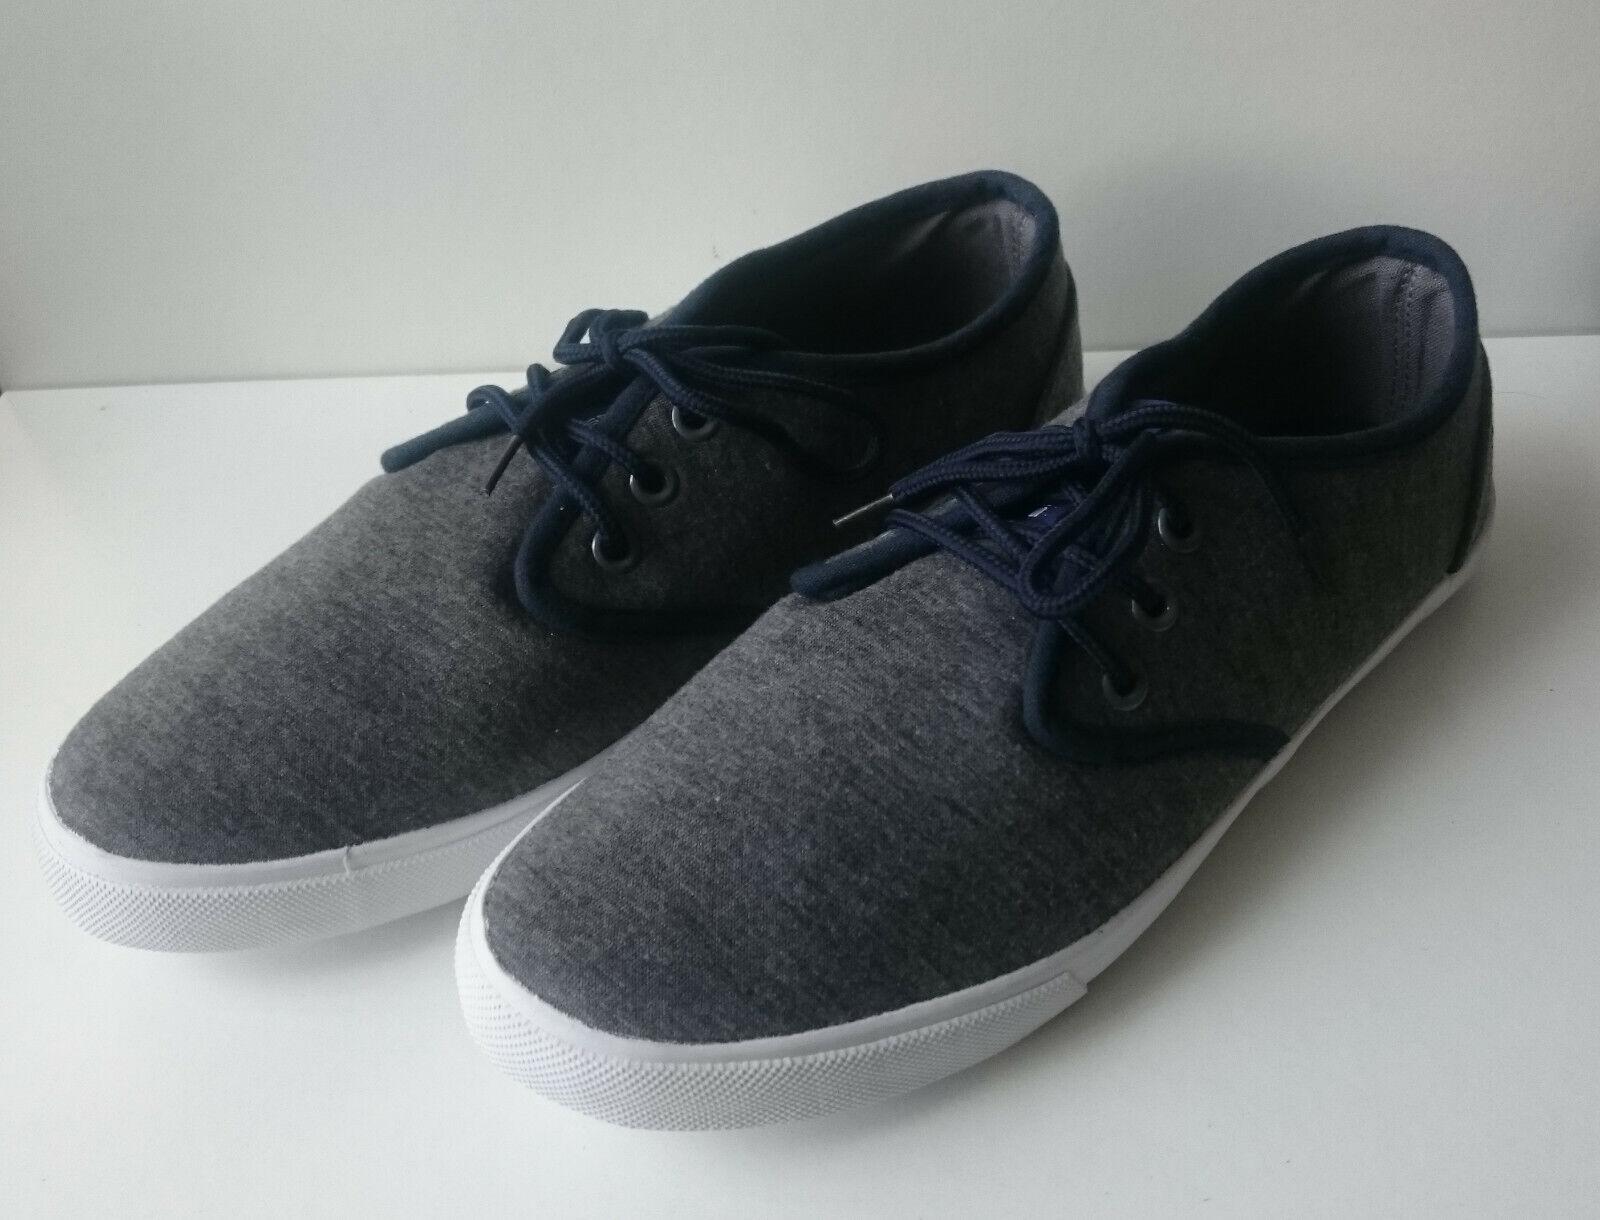 Grey / Navy Canvas Pumps Shoes - Size